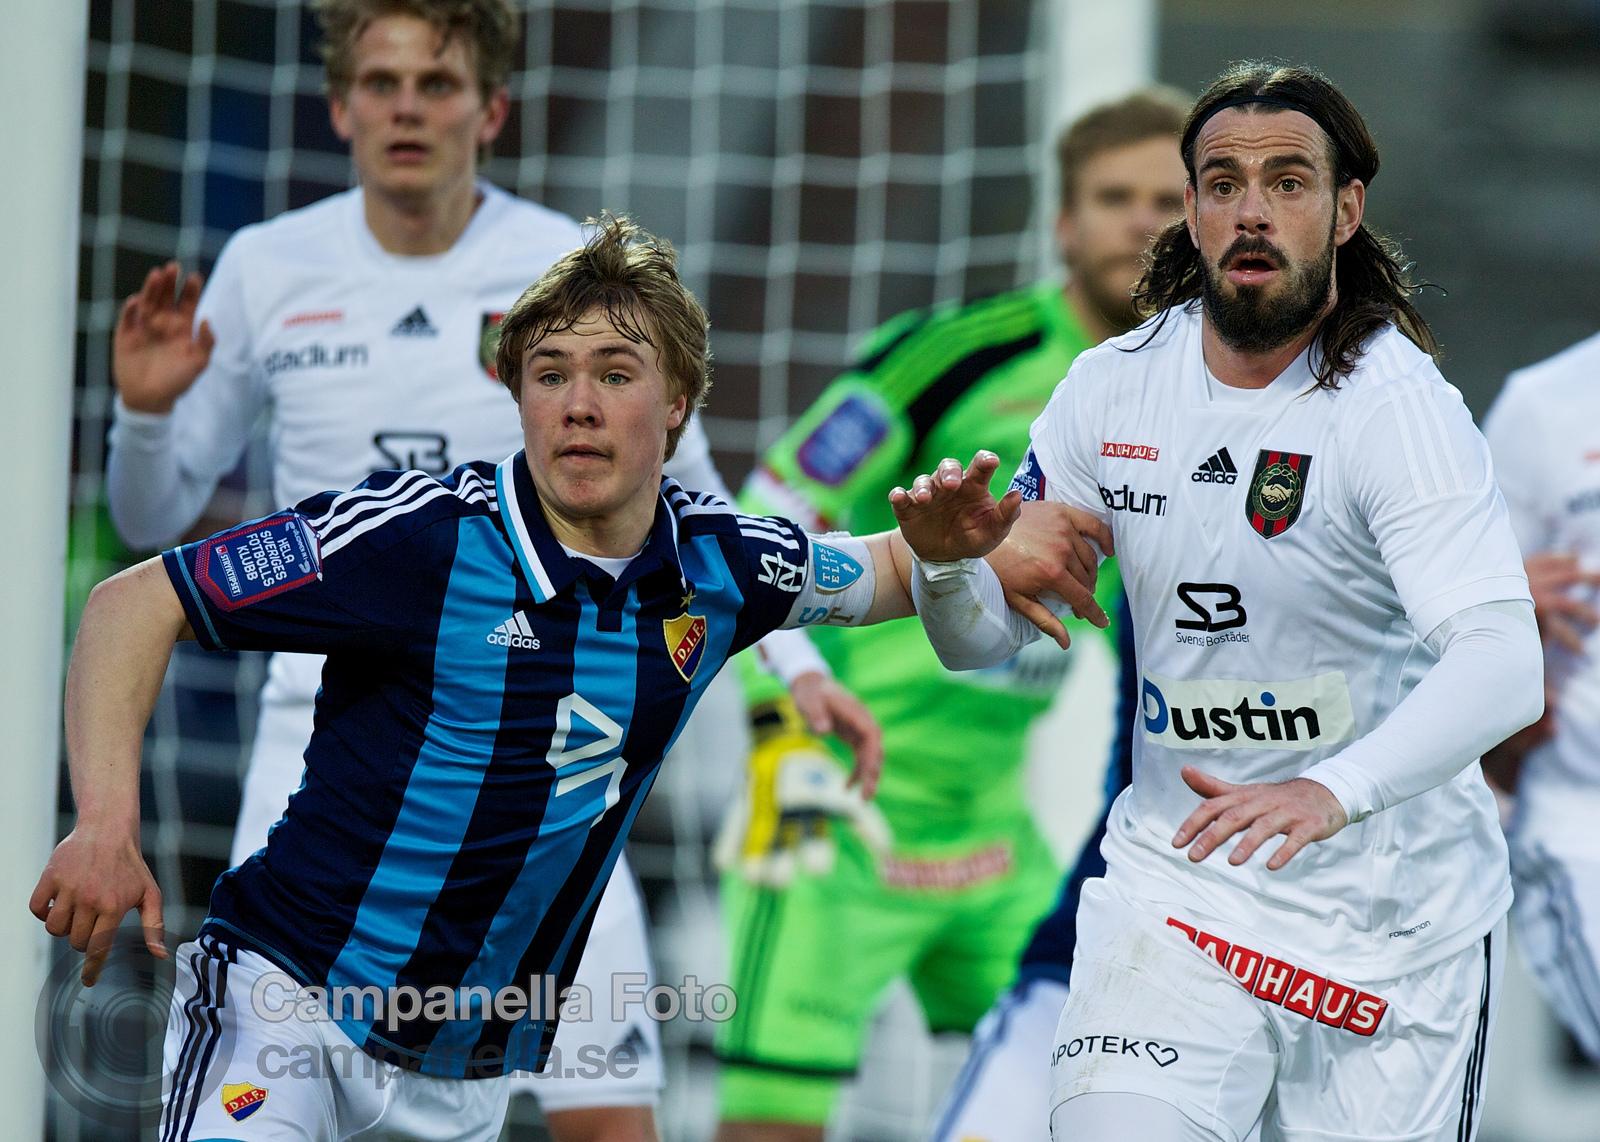 Djurgården IF - Brommapojkerna - 4 of 5